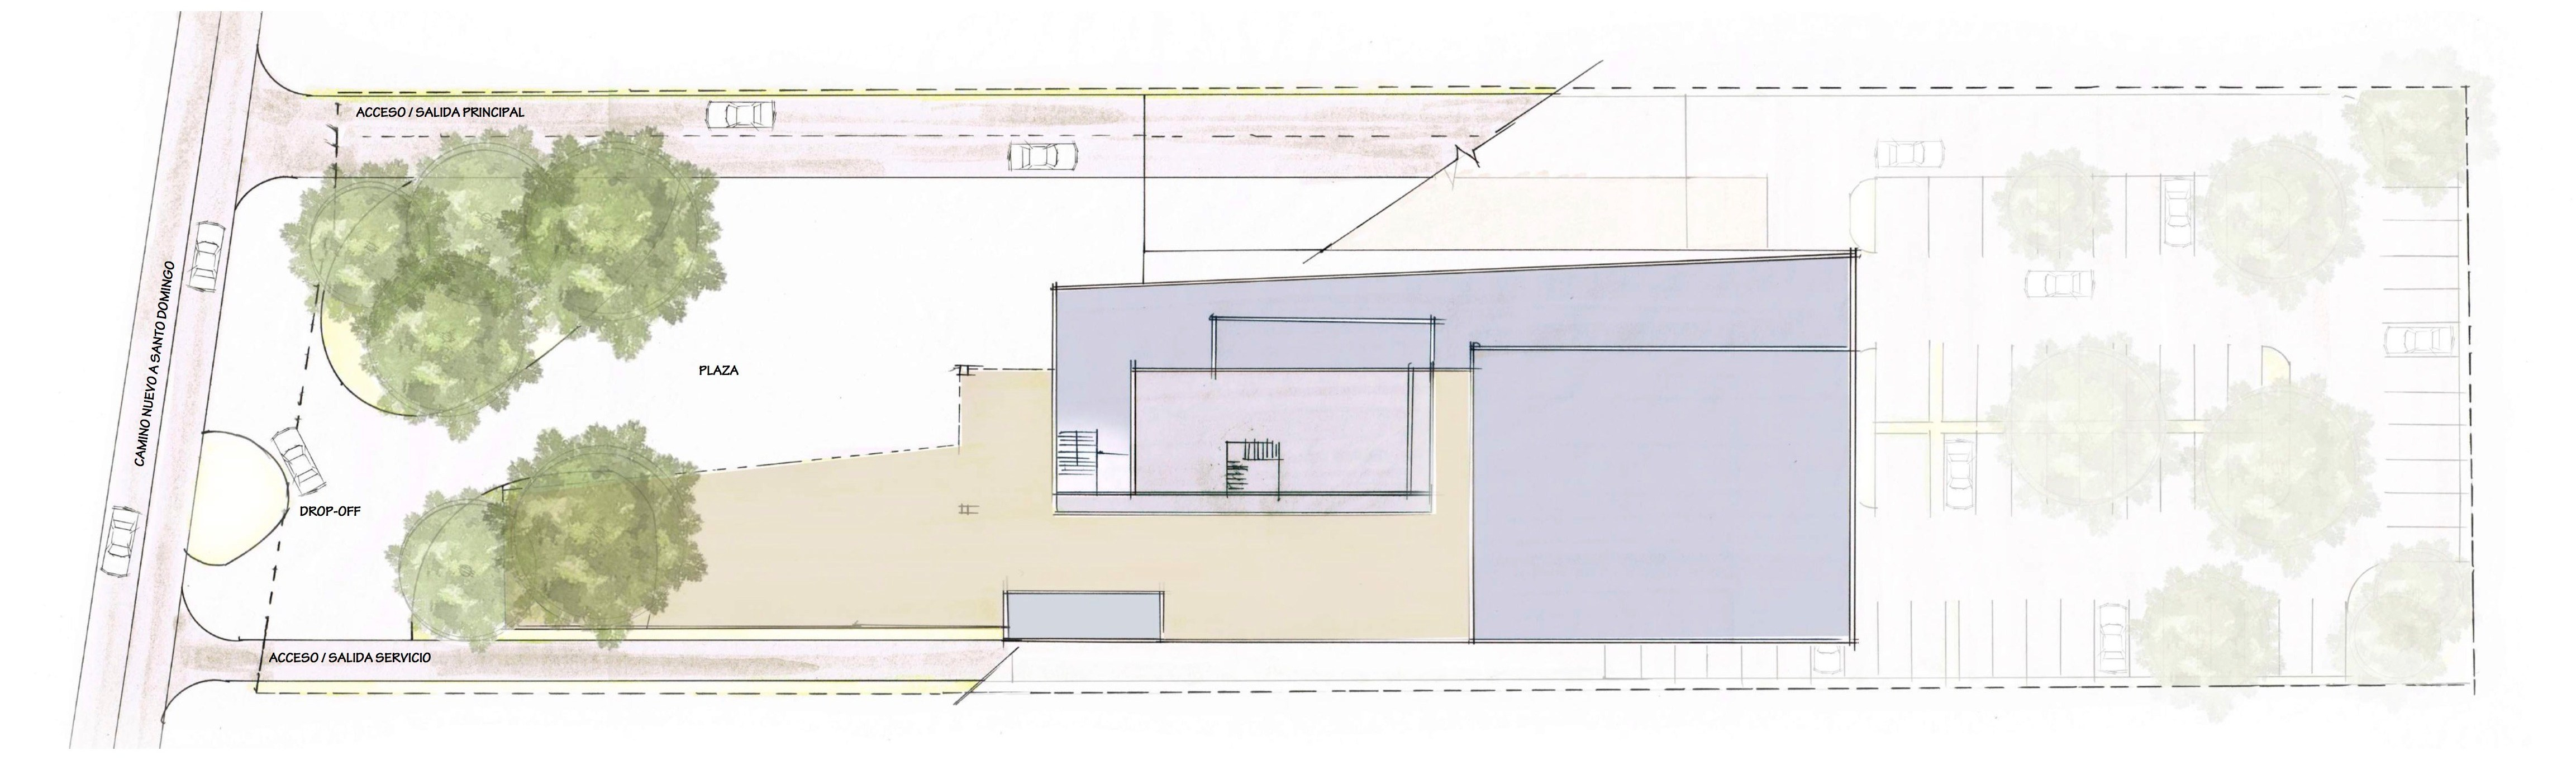 canvas-set-conceptual-plano-maestro-1-e1520892735497.jpg